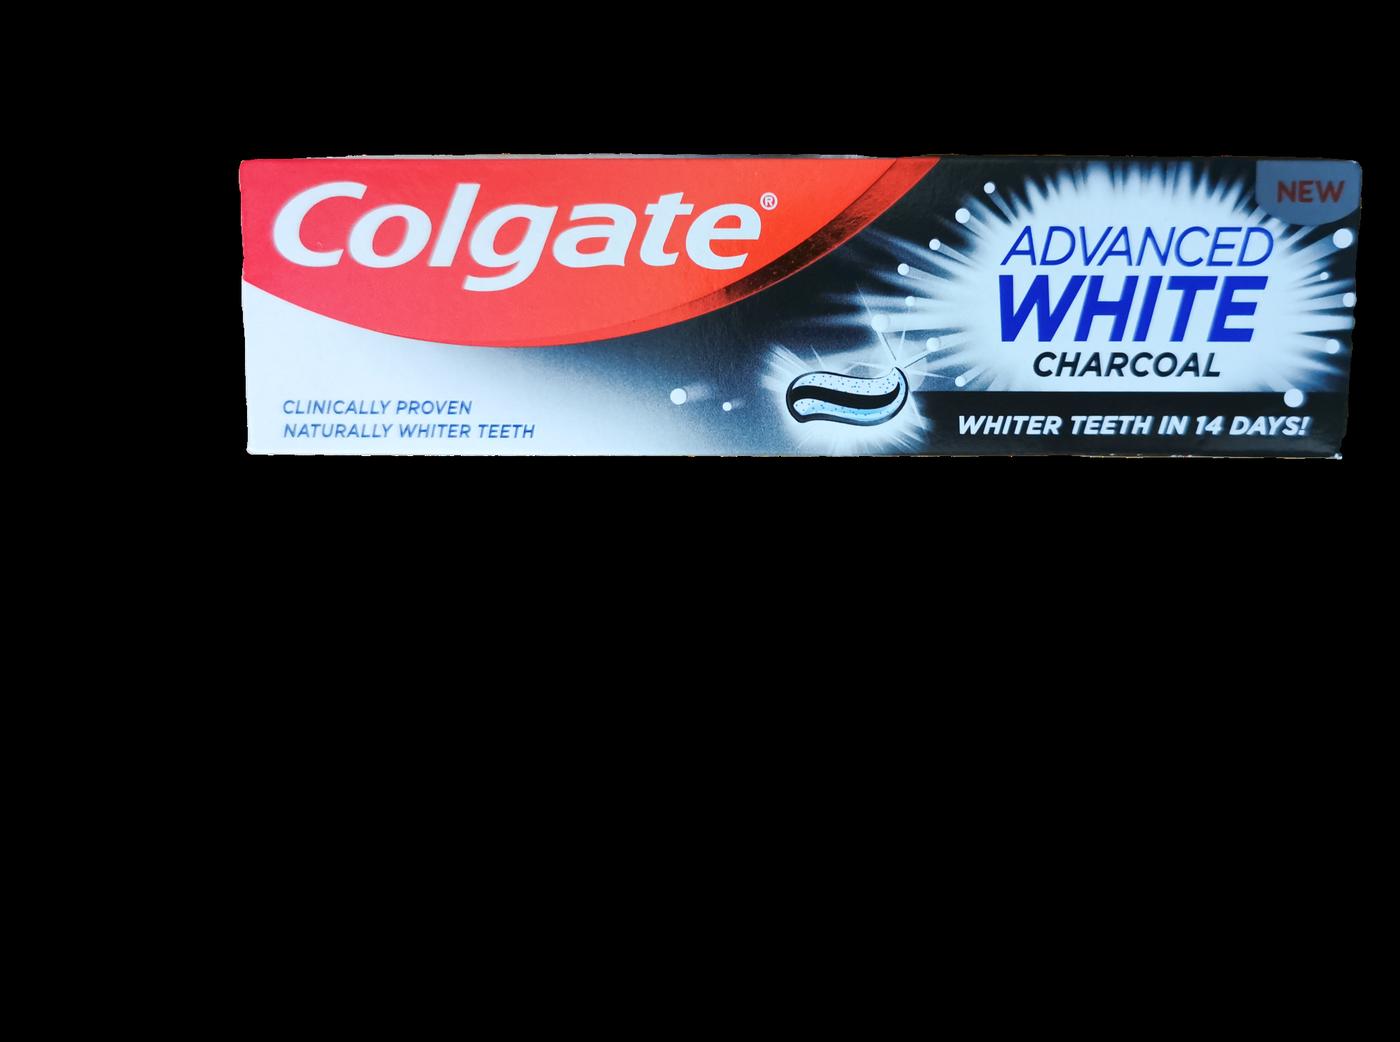 Colgate Advanced White Charcoal